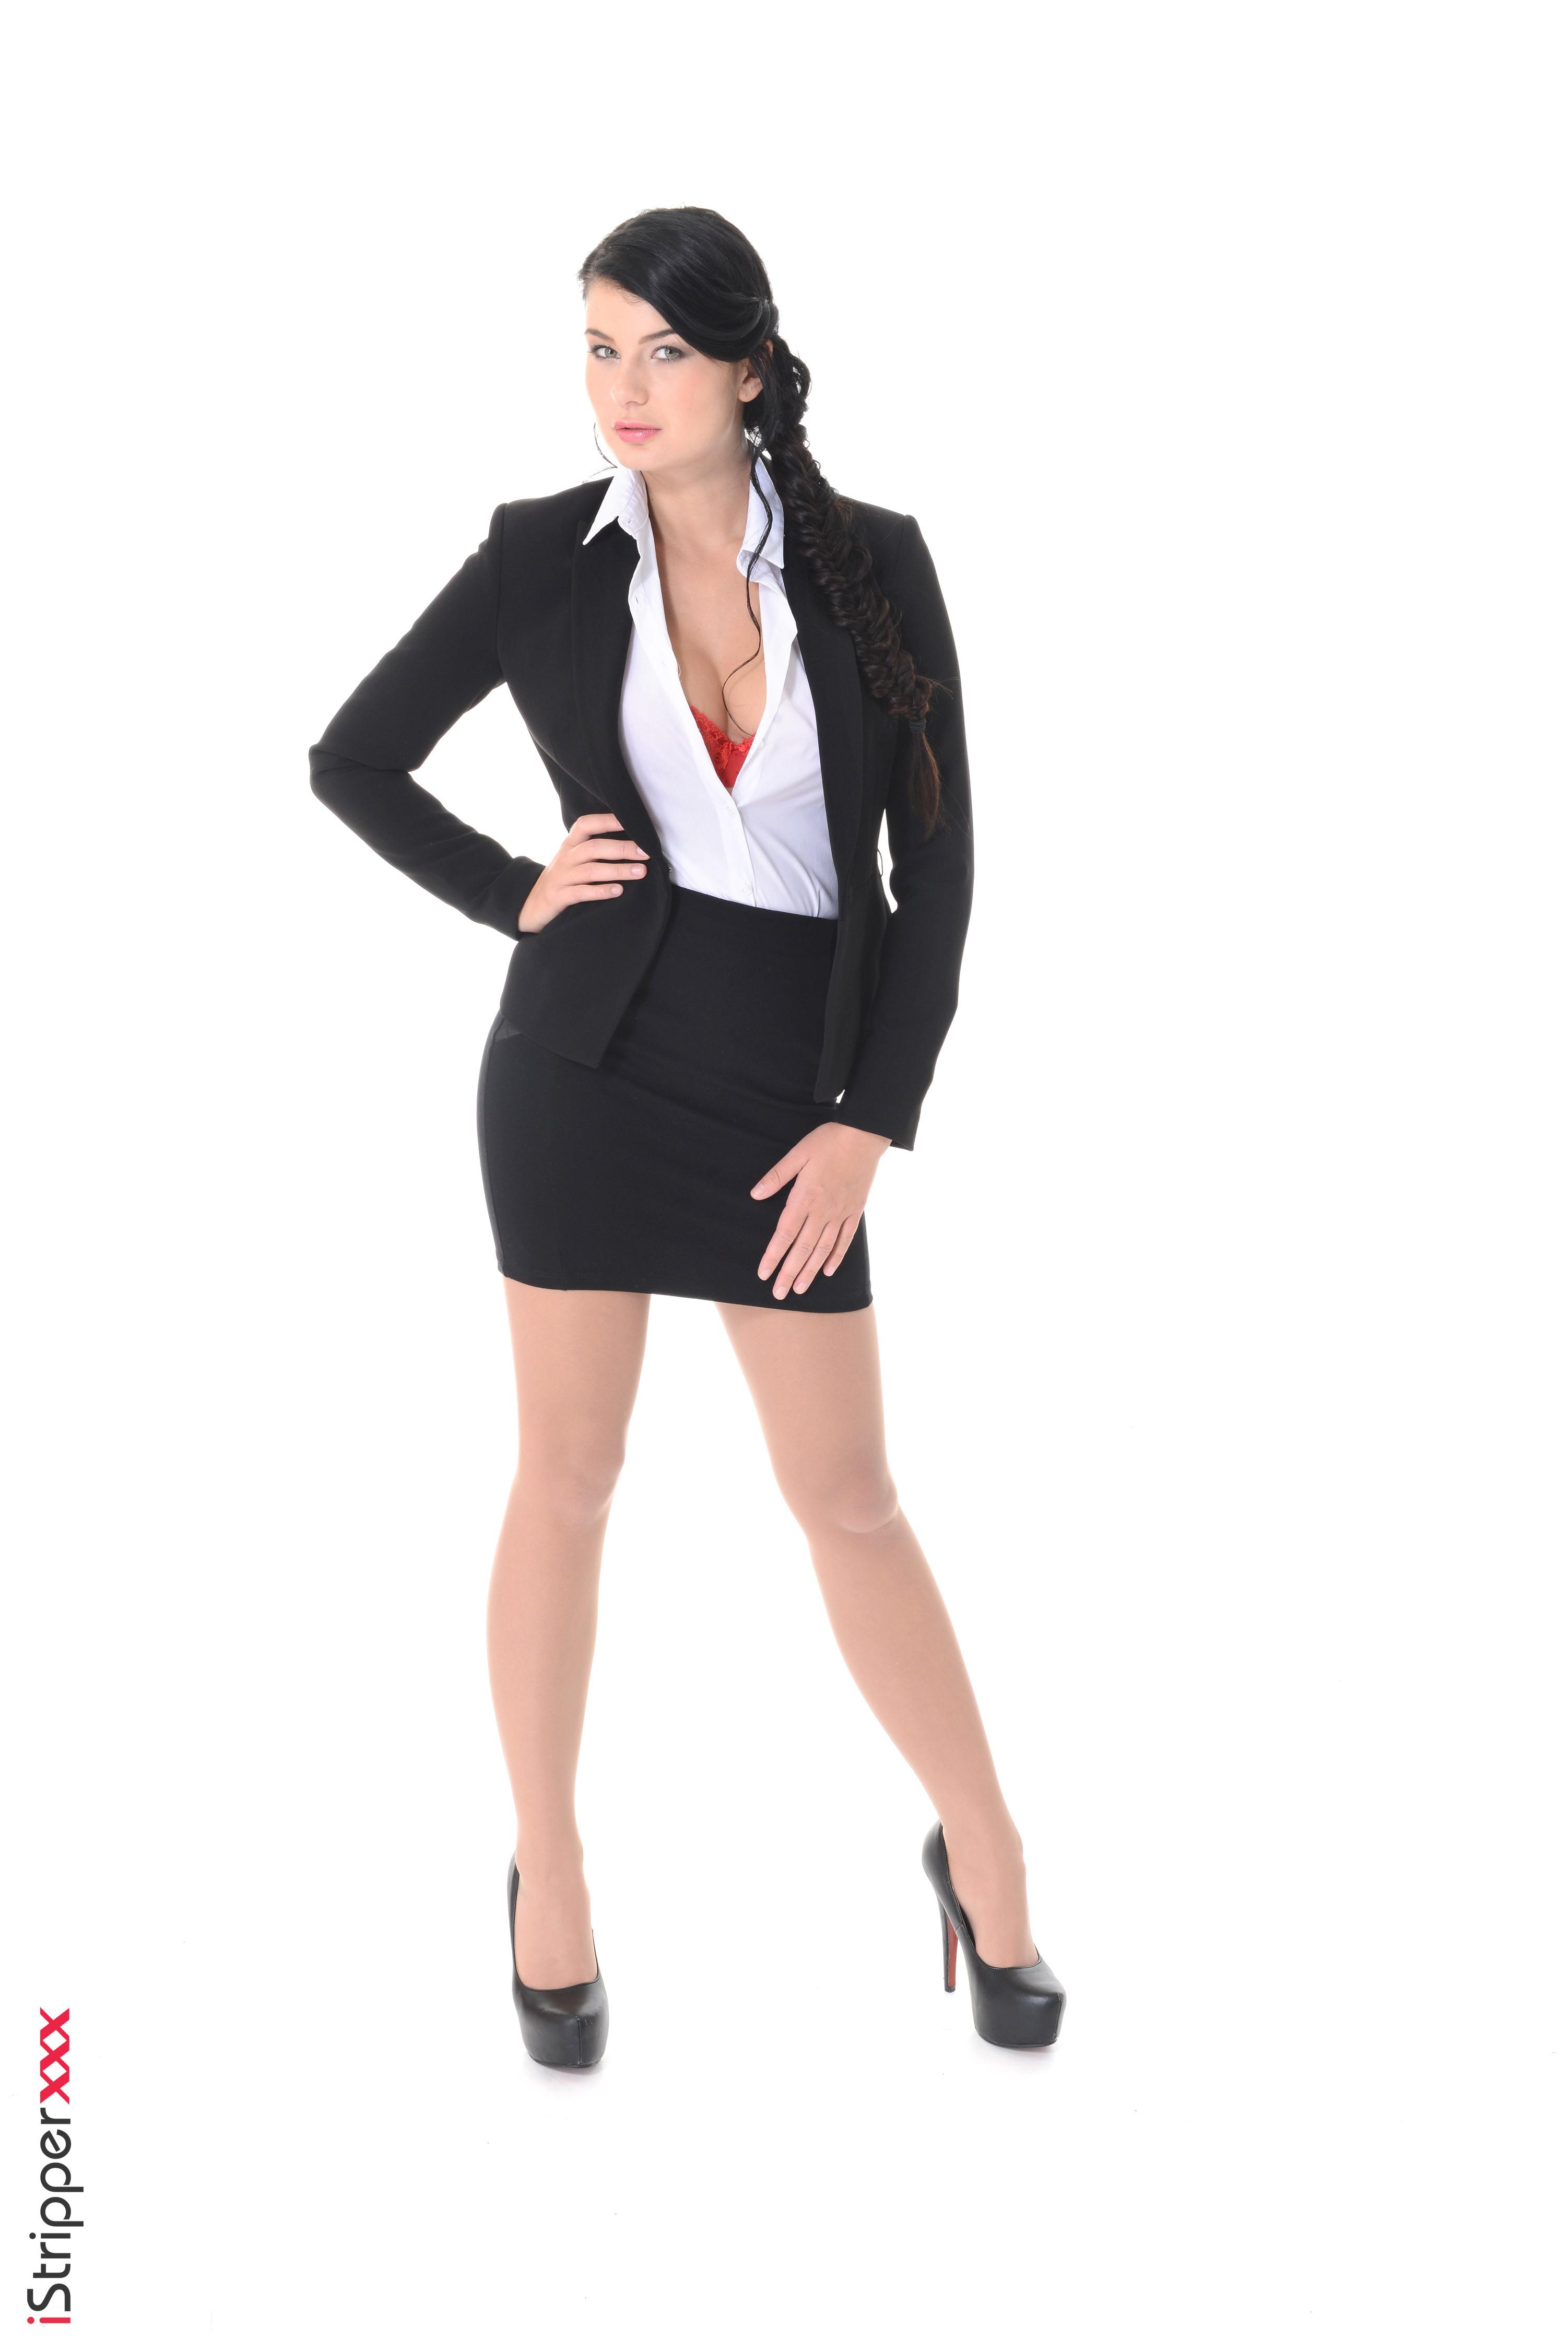 3003x4500,Lucy Li,iStripper,白色背景,黑发,西裝,手,裙,腿,皮鞋,年輕女性,女孩,